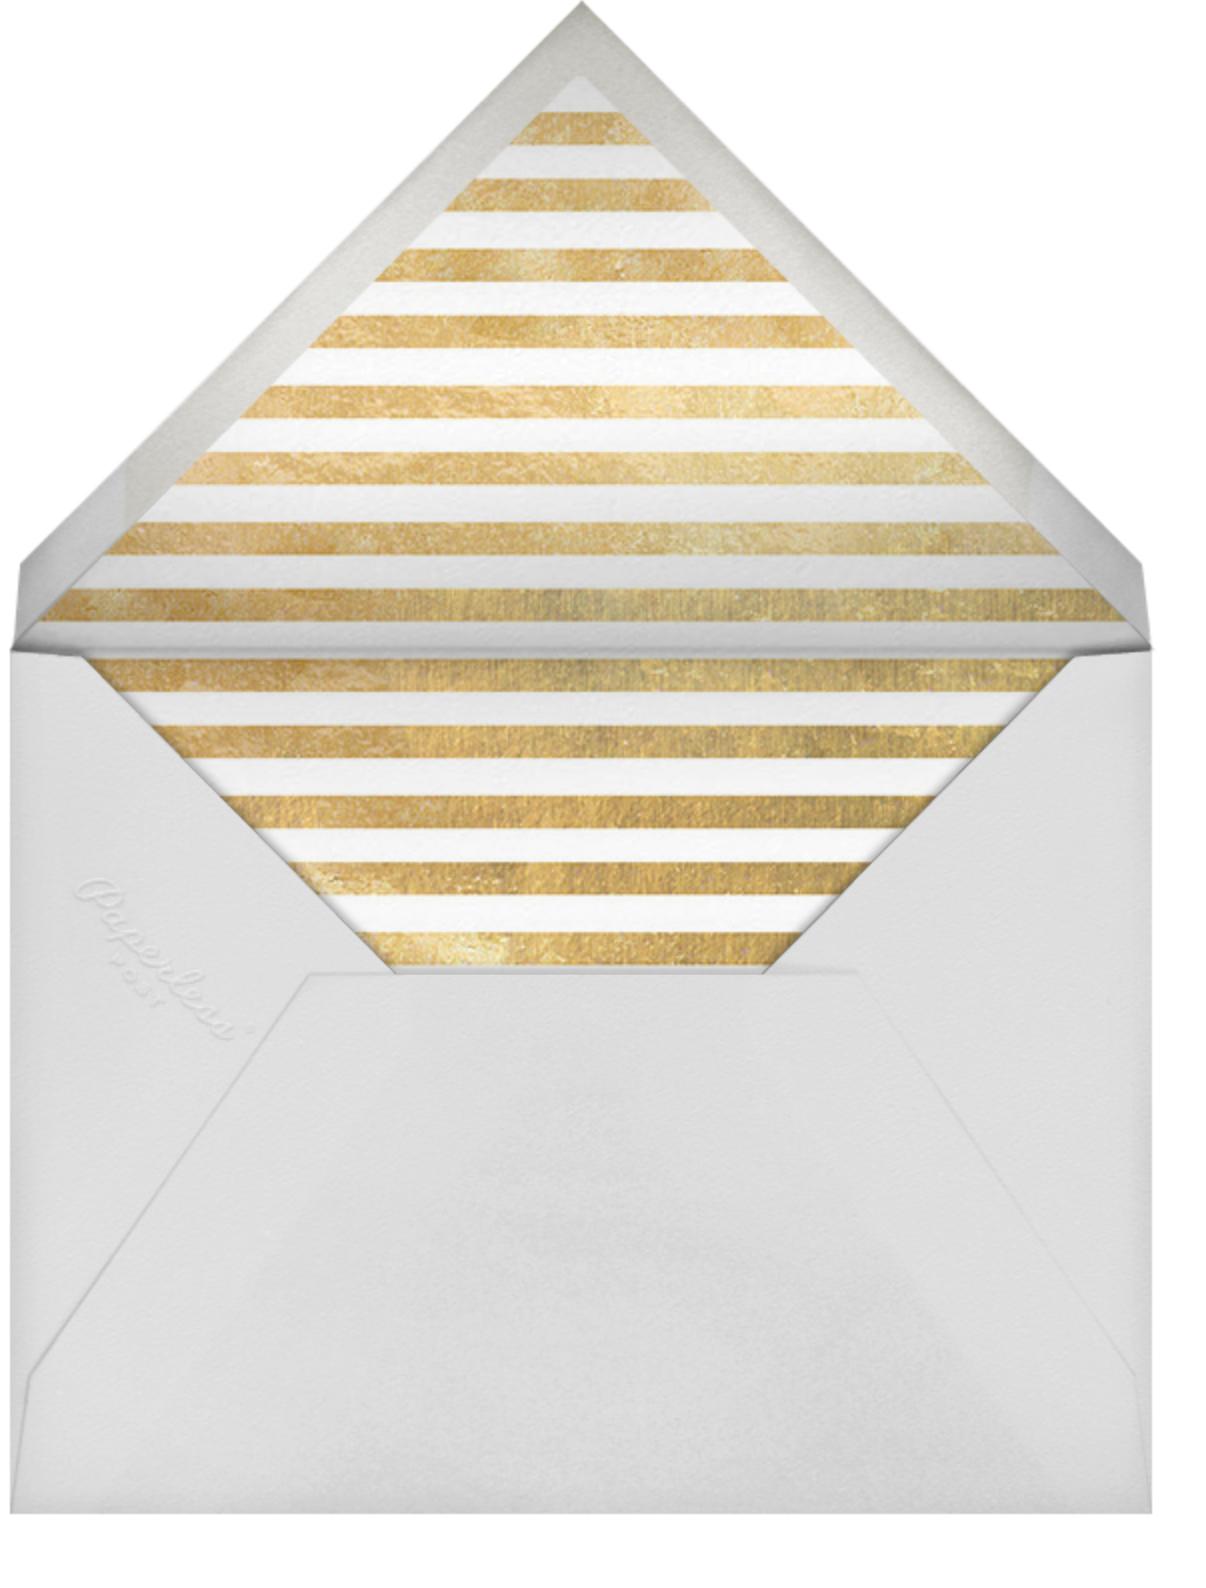 Inner Leaf Gold Bevel Border - Midnight Tall - Paperless Post - Charity and fundraiser  - envelope back